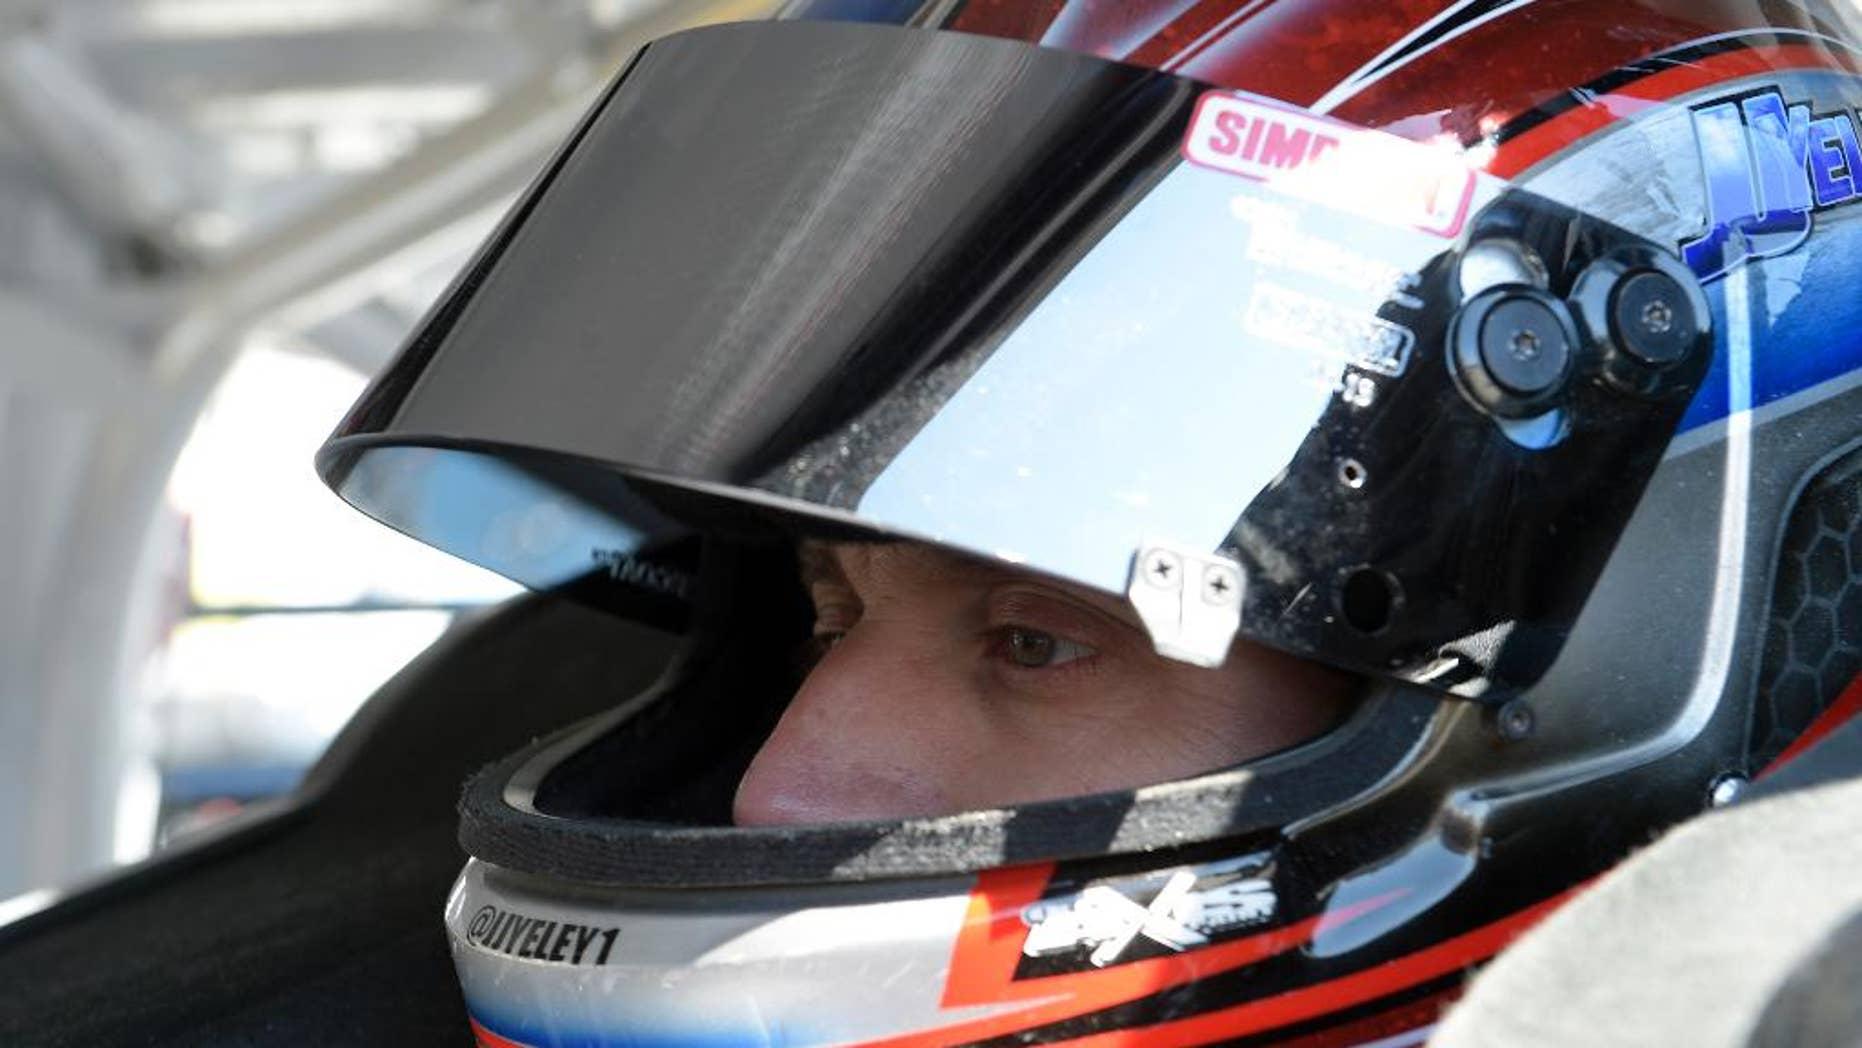 J.J. Yeley sits in his car before practice for the Daytona 500 NASCAR Sprint Cup series auto race at Daytona International Speedway in Daytona Beach, Fla., Thursday, Feb. 19, 2015. (AP Photo/Phelan M. Ebenhack)